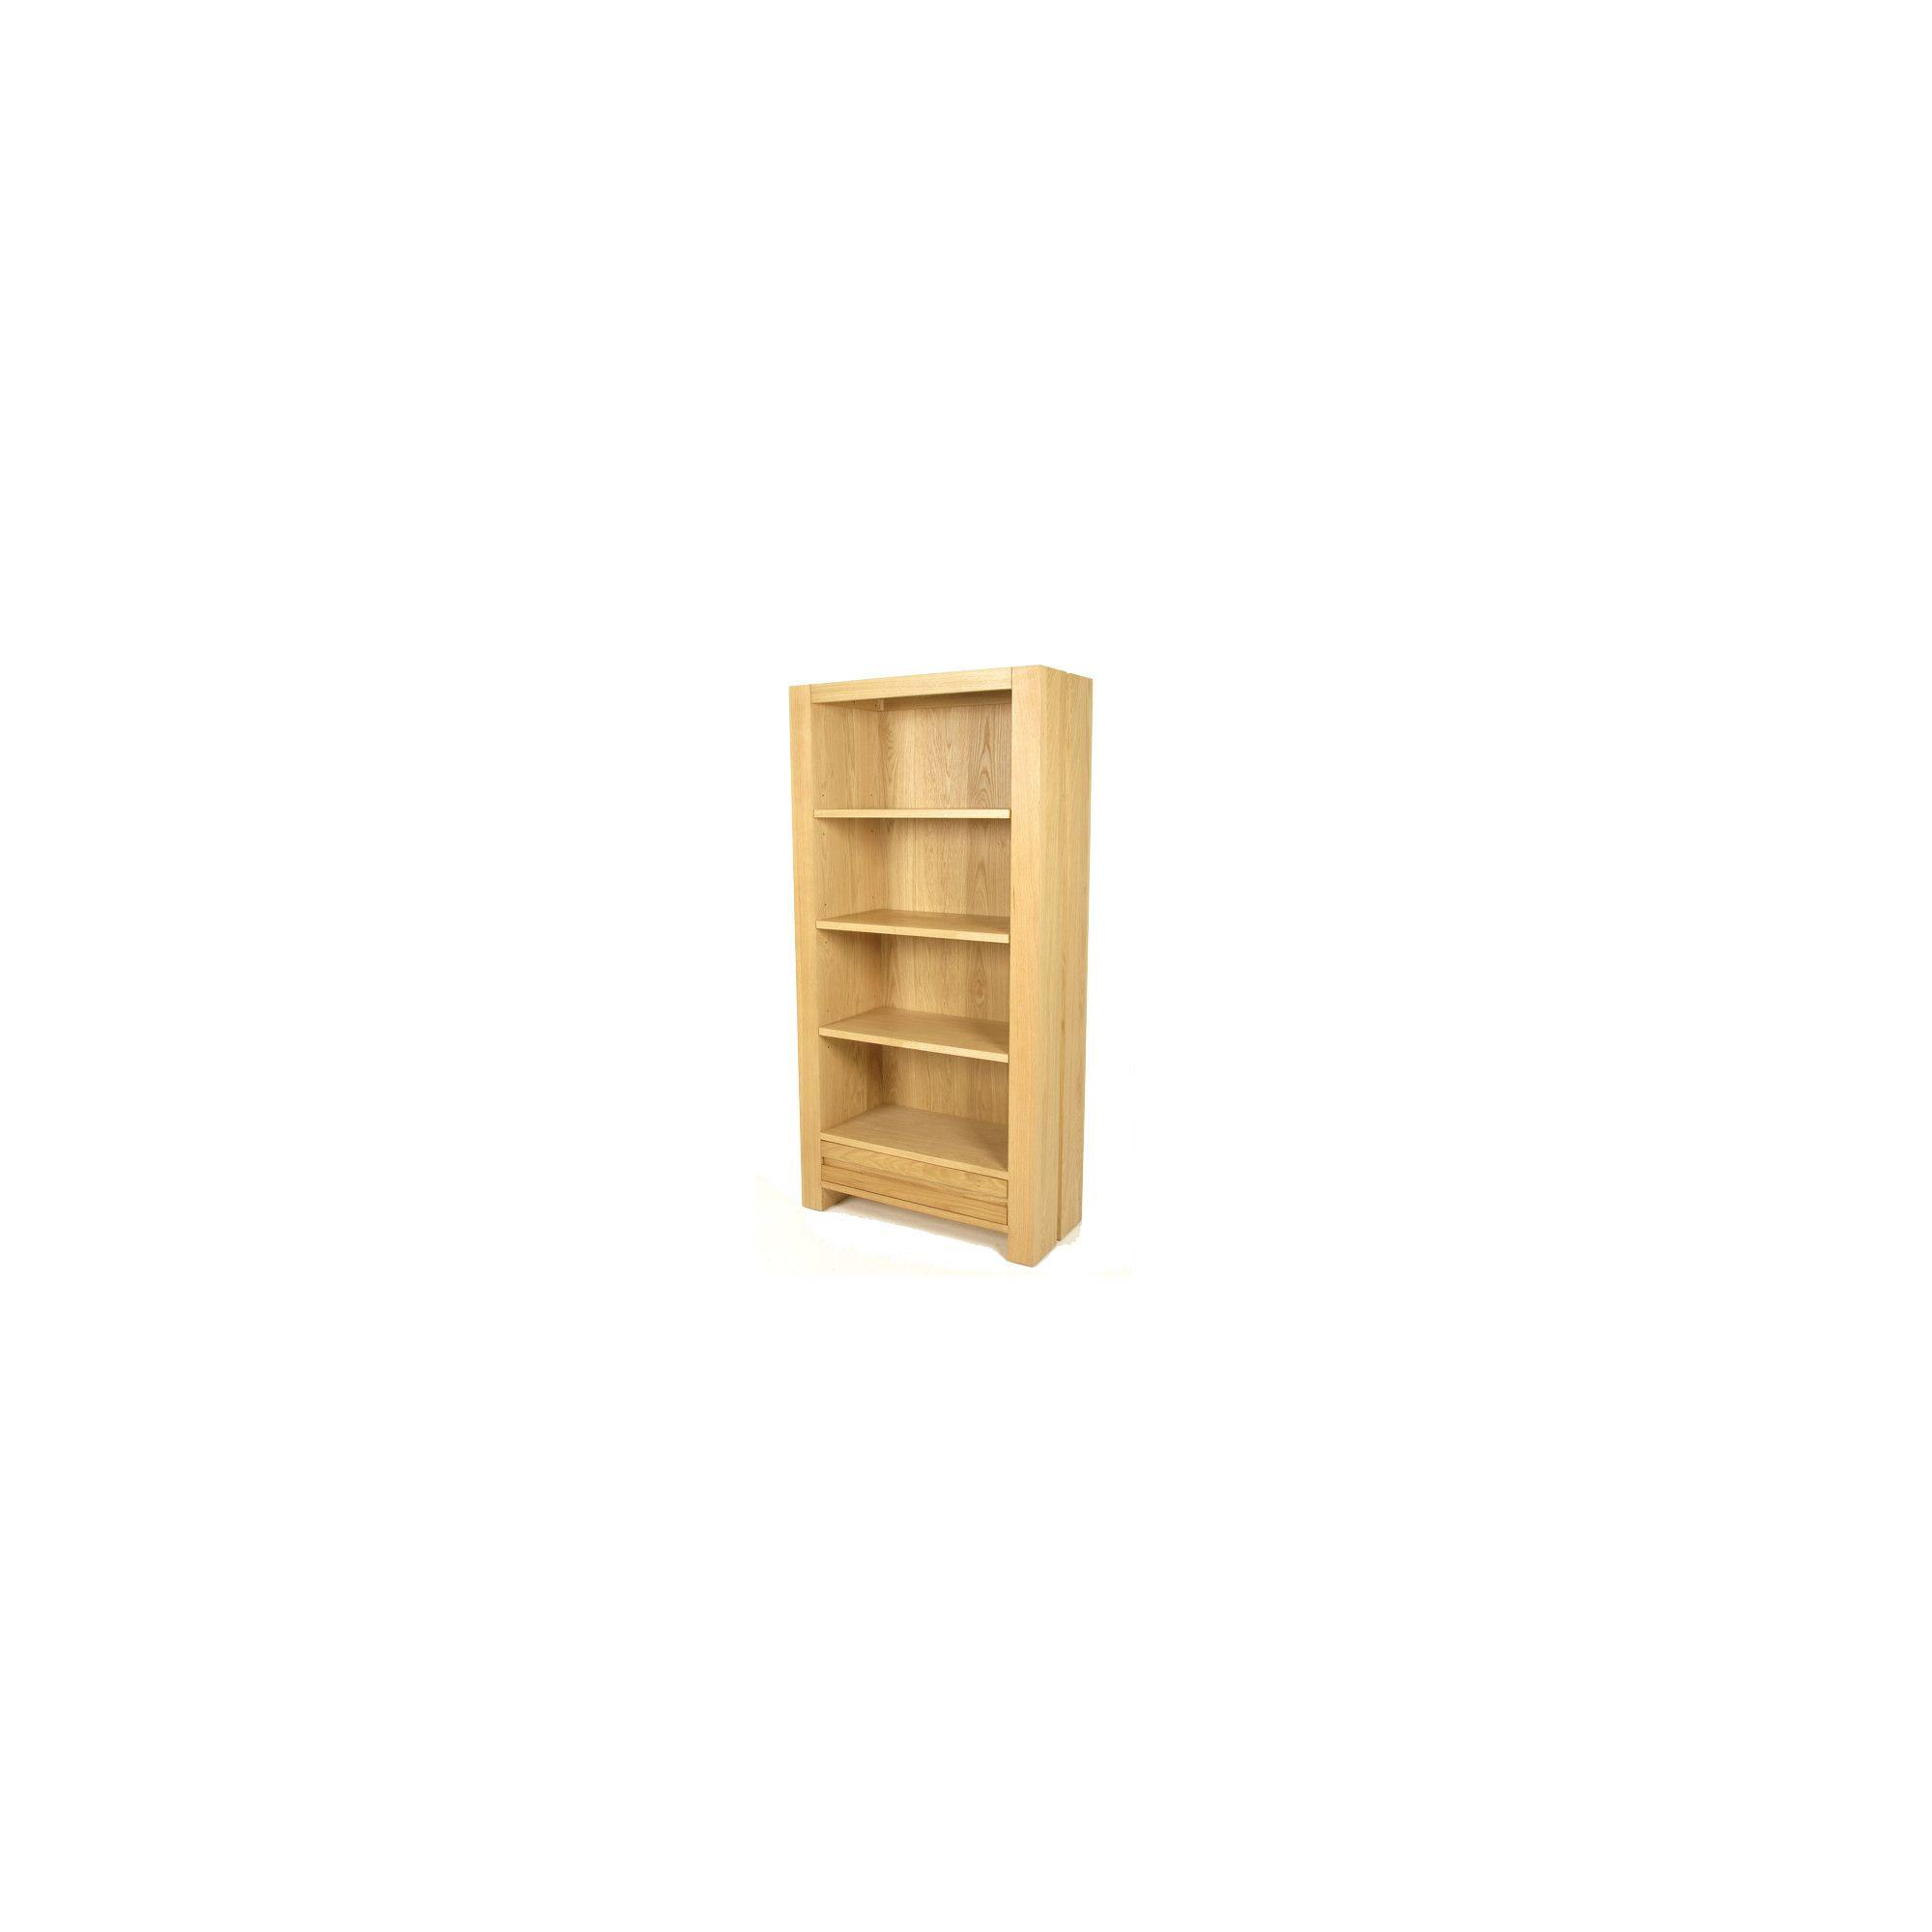 Elements Eton Oak High Bookcase at Tesco Direct